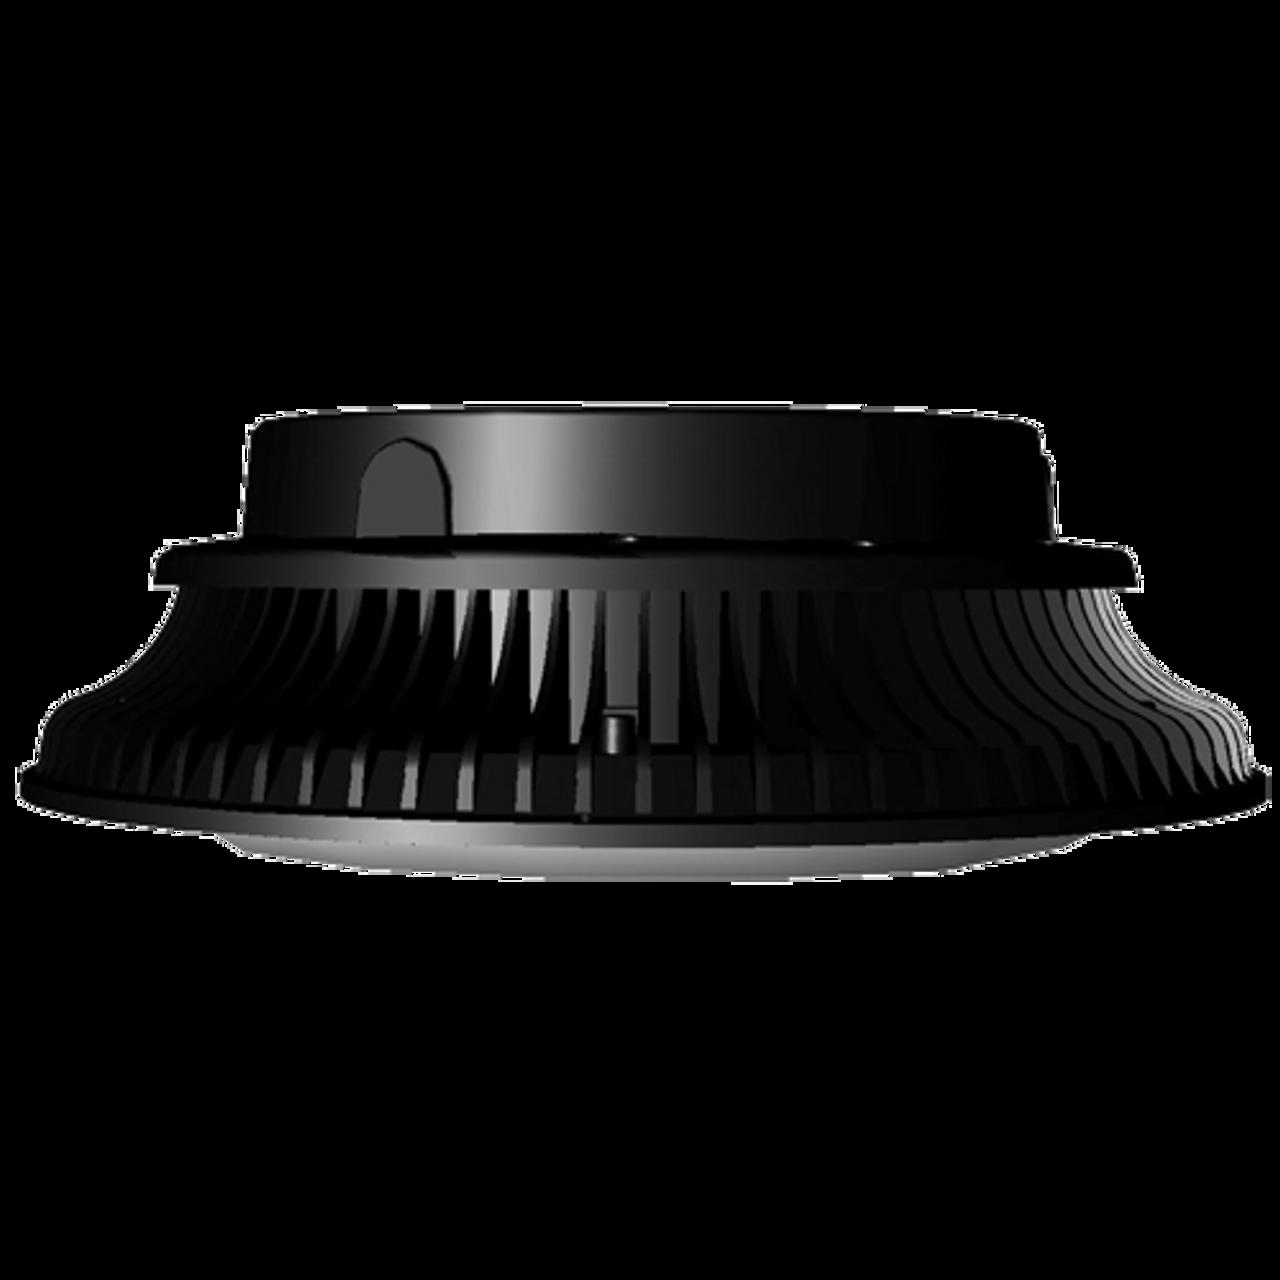 65 Watt LED Reveal Small Round Canopy Light